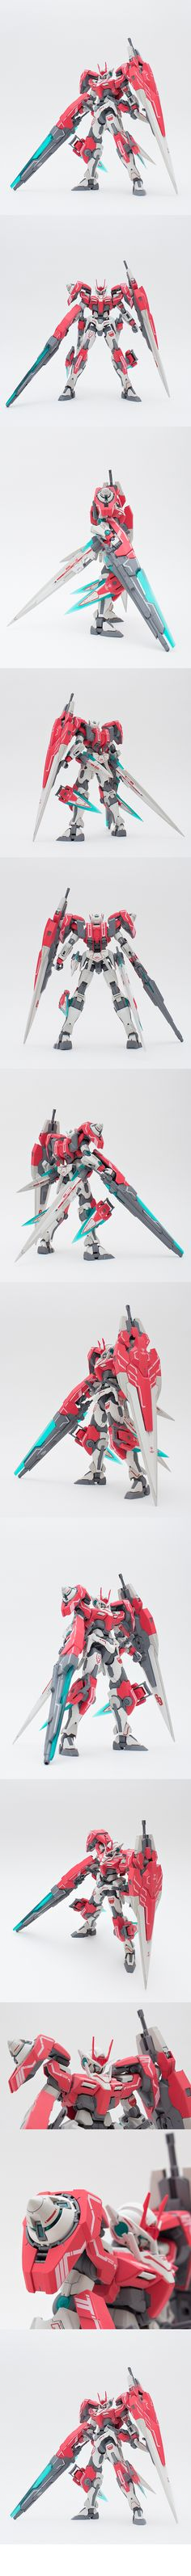 MG 1/100 GN-0000GNHW Gundam Seven Sword/G Ver.Inspection. Modeled by Kenshin.